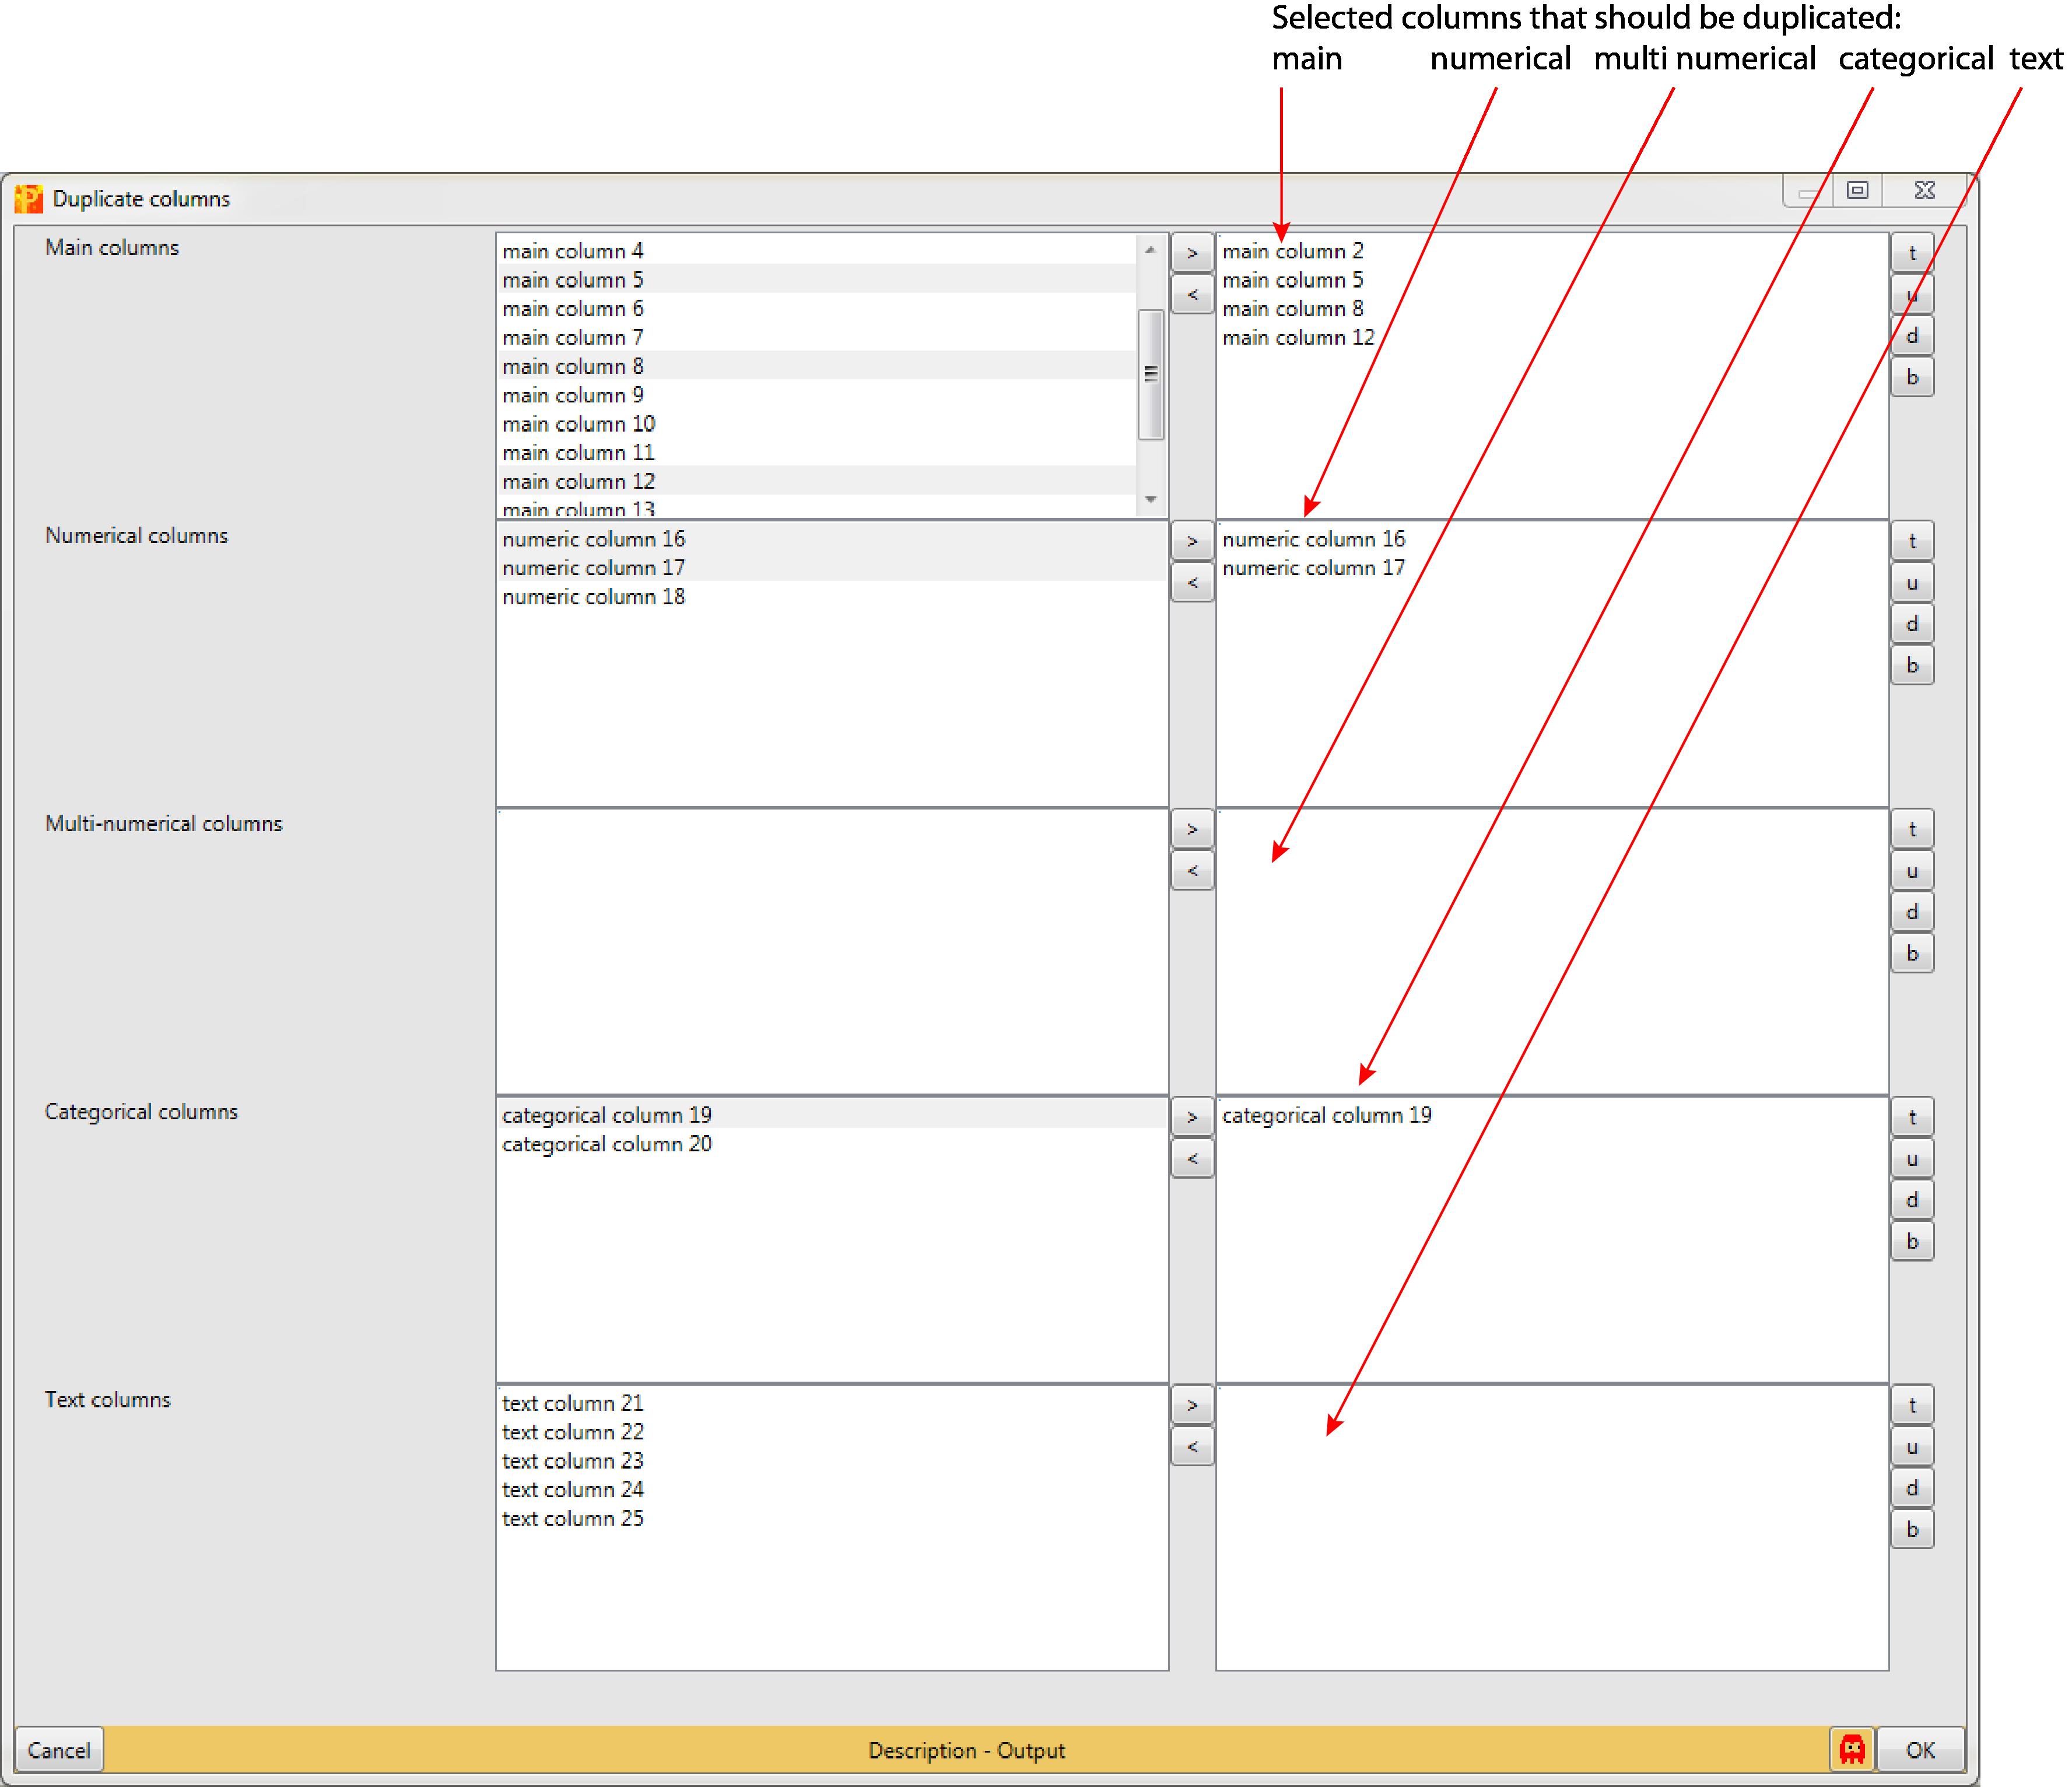 perseus:user:activities:matrixprocessing:rearrange